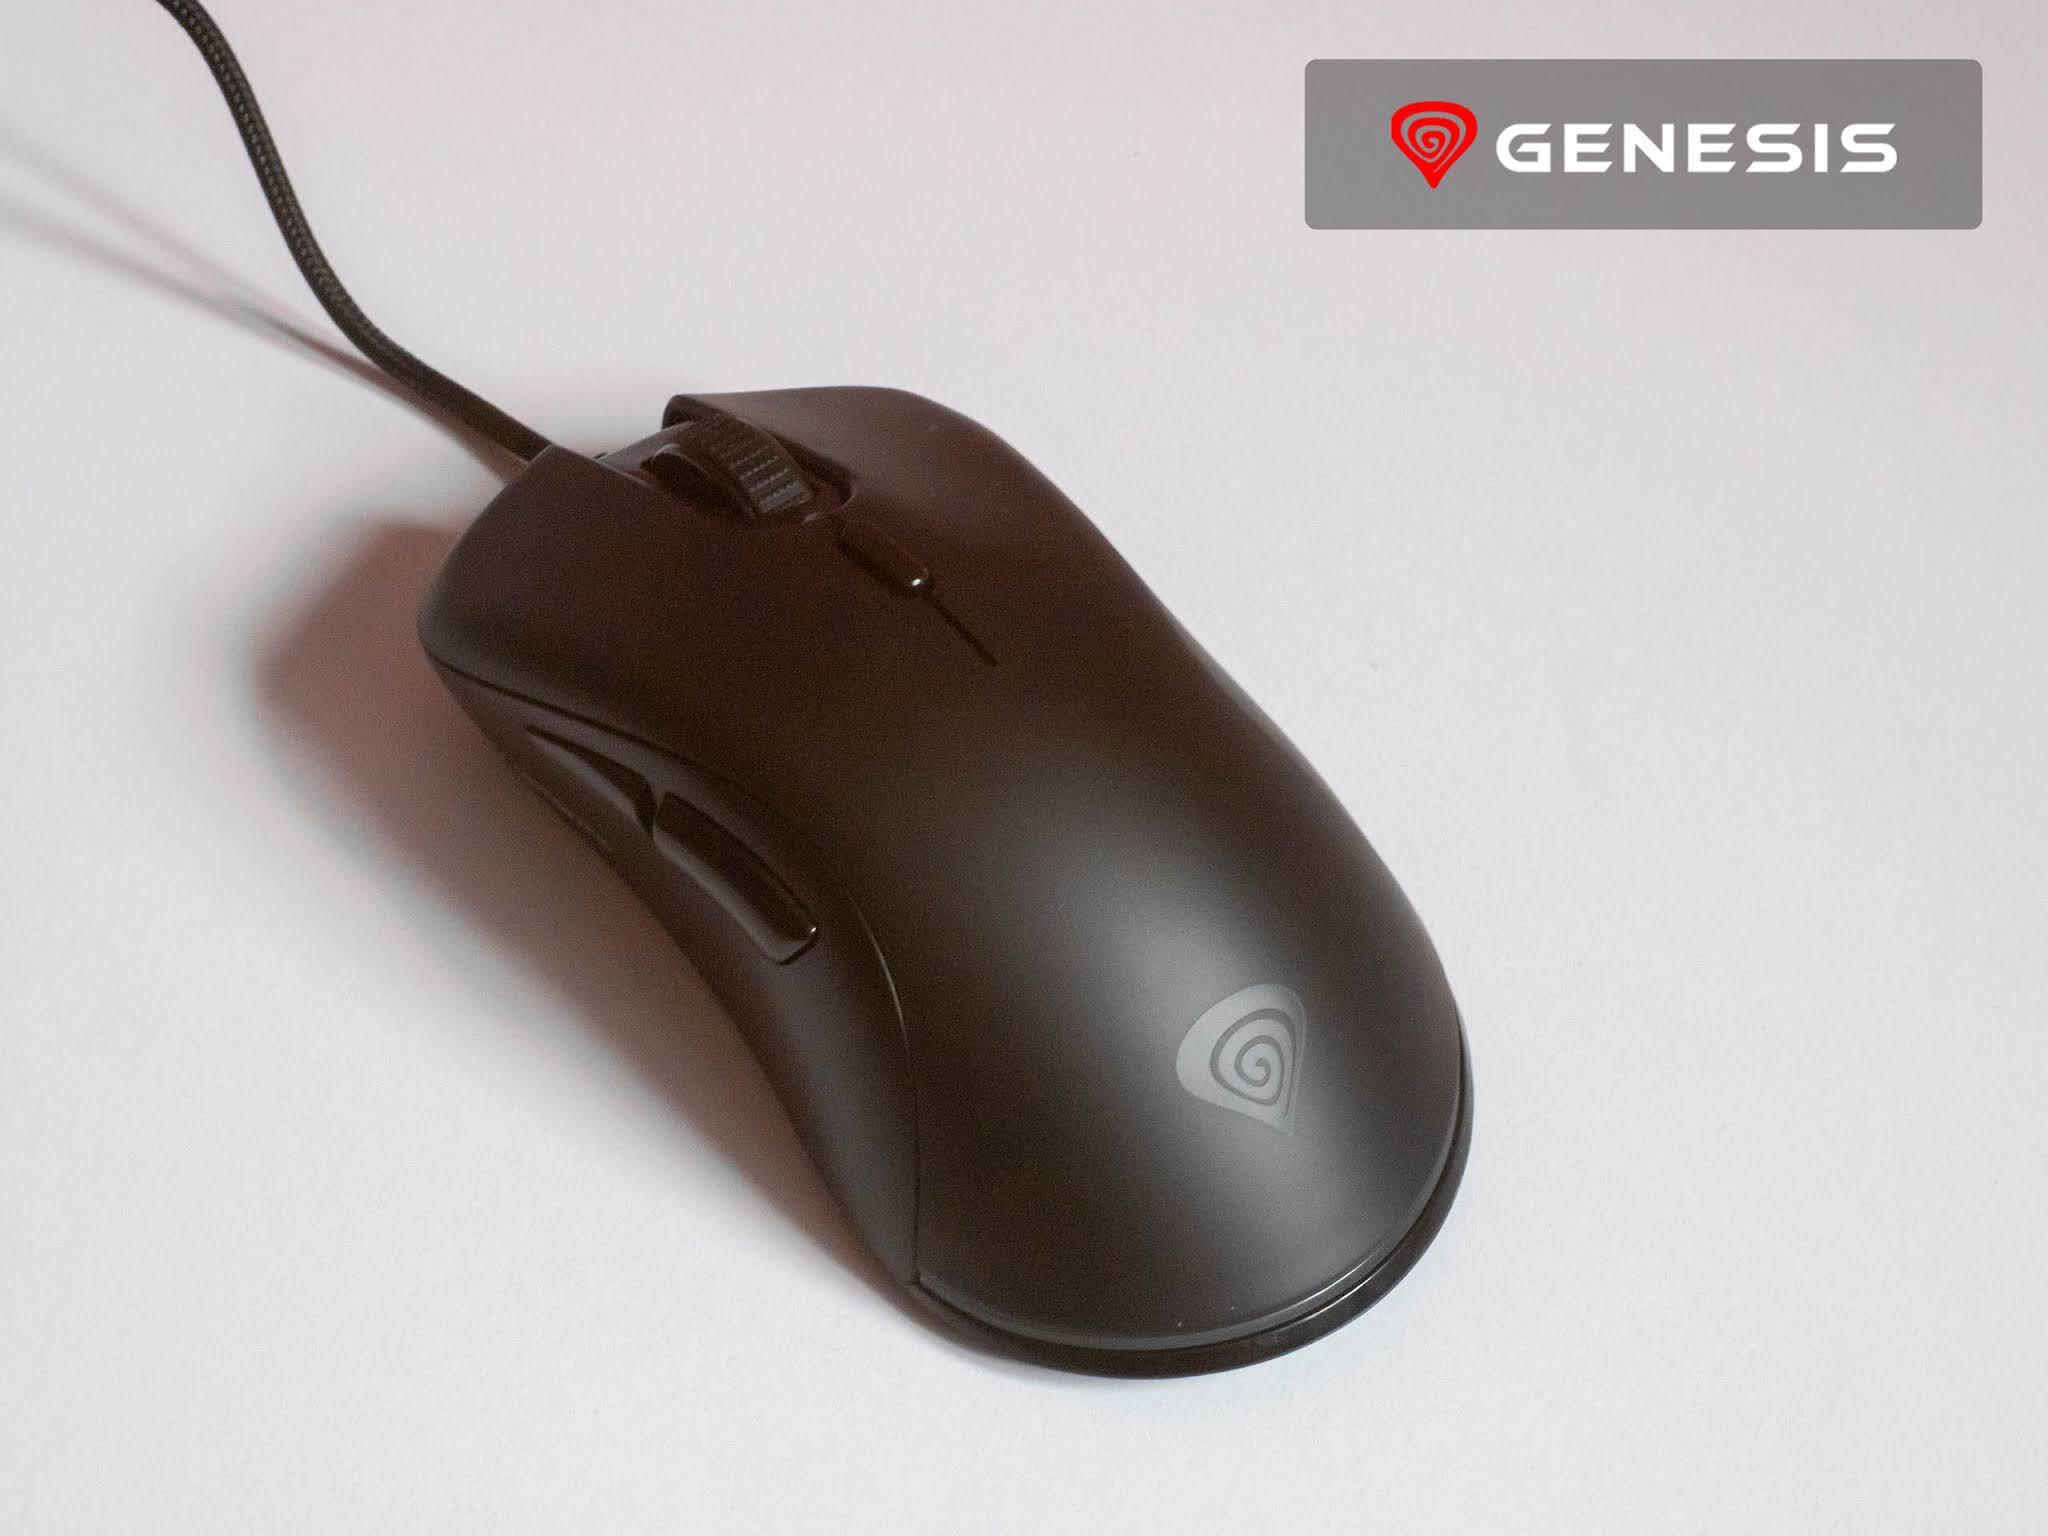 Genesis Krypton 200 wygląd